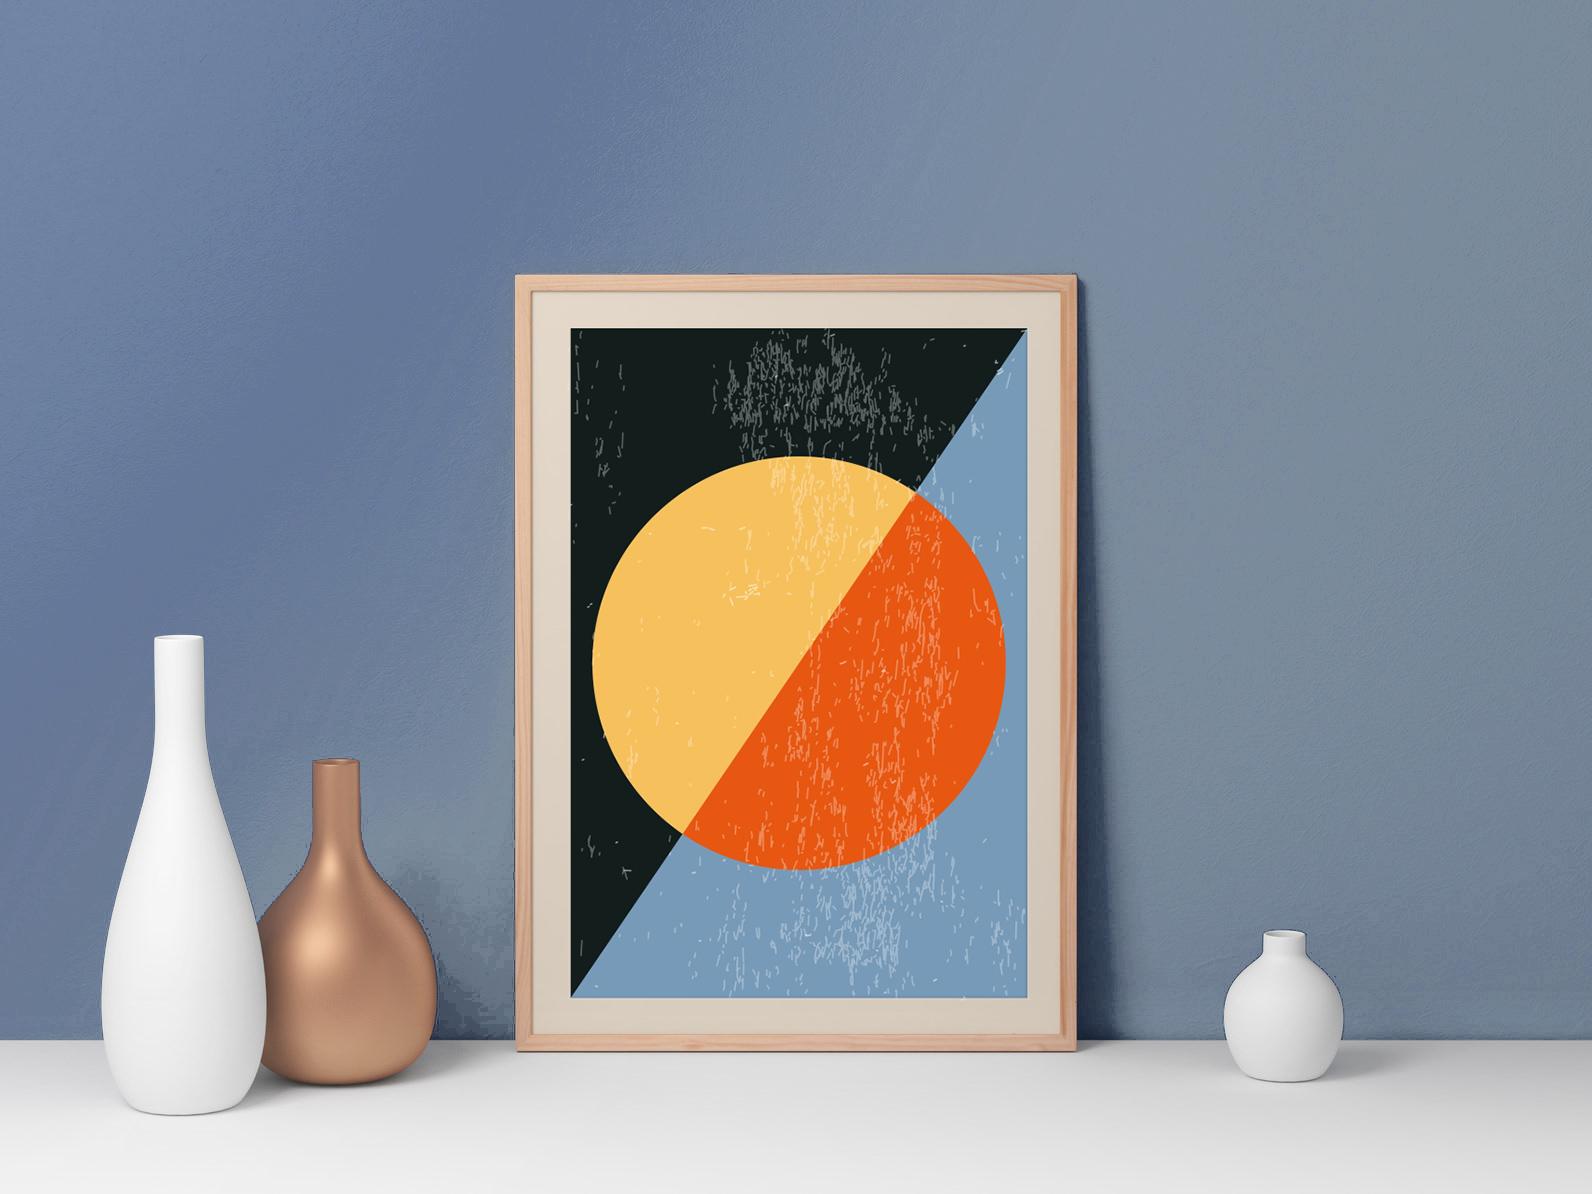 Plakat - Grafika z kołem i kolorami - fototapeta.shop